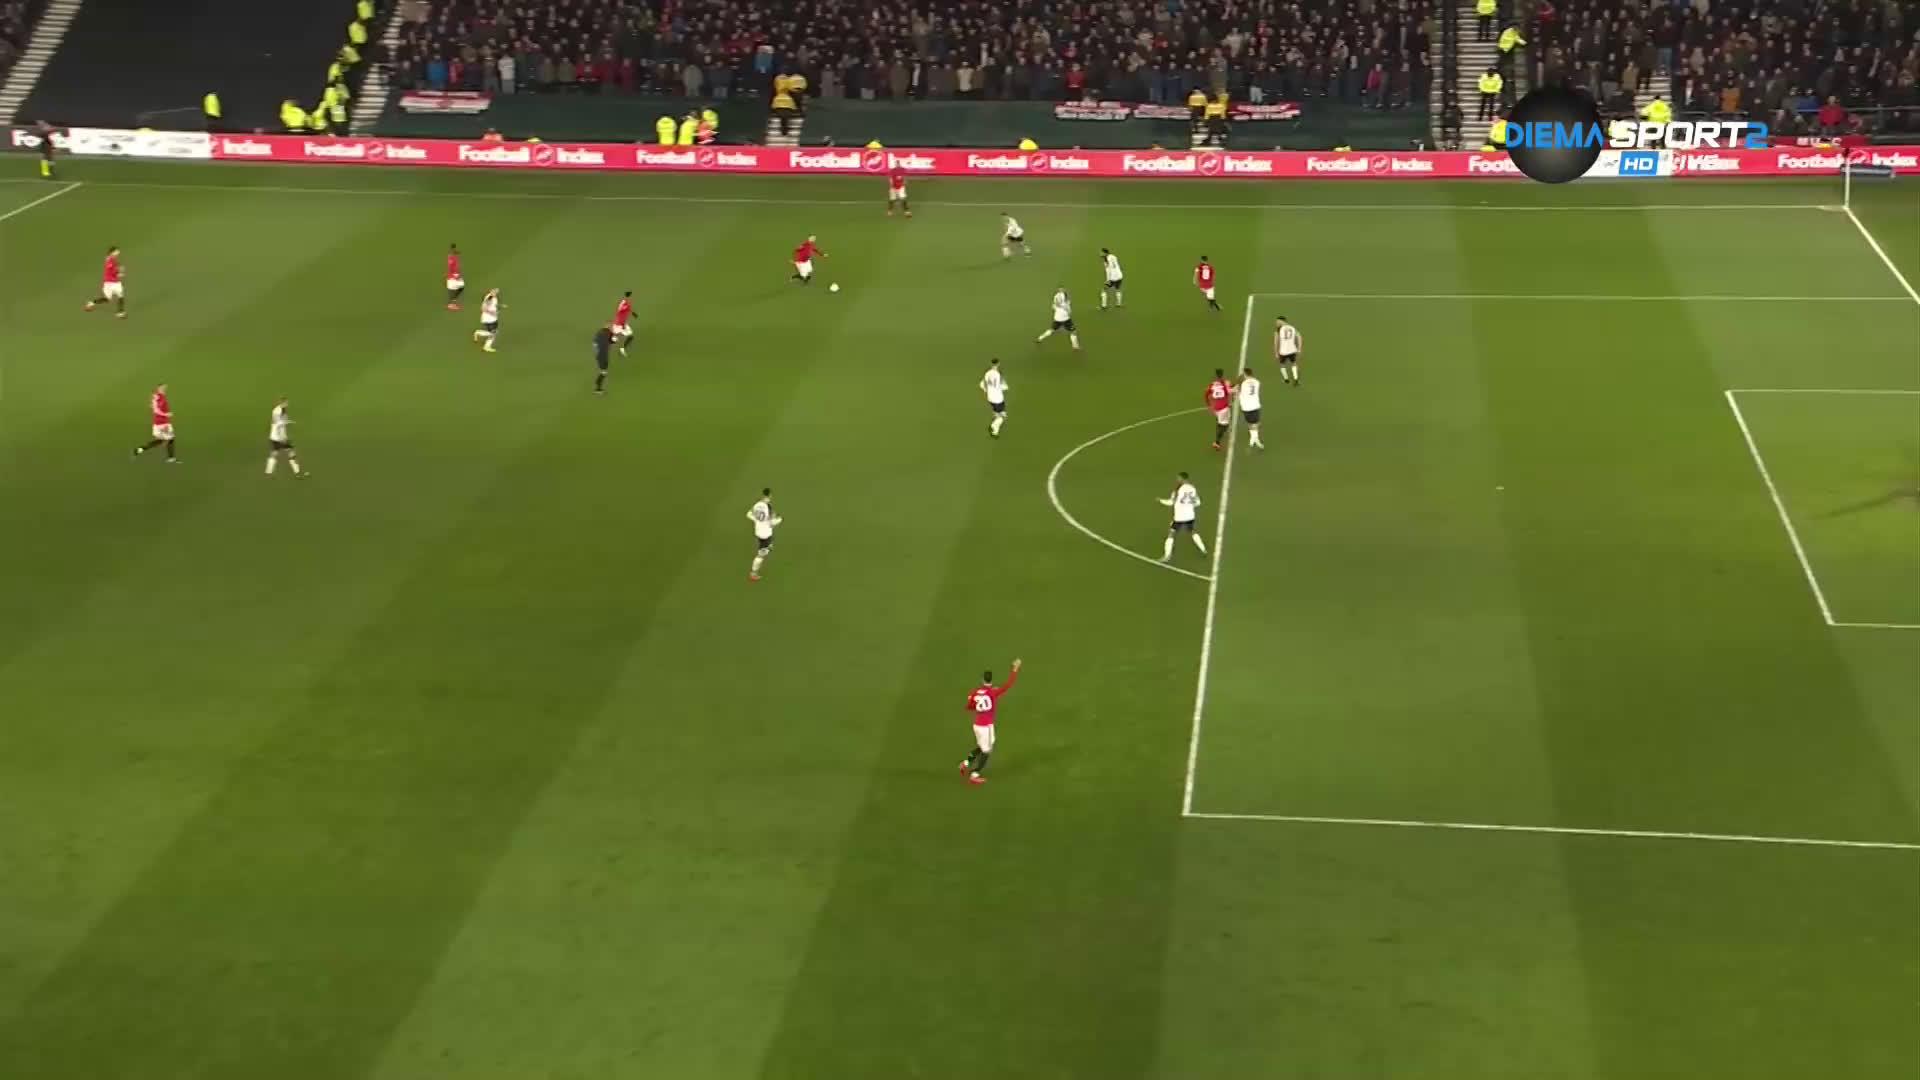 Игало покачи аванса на Ман Юнайтед над Дарби Каунти